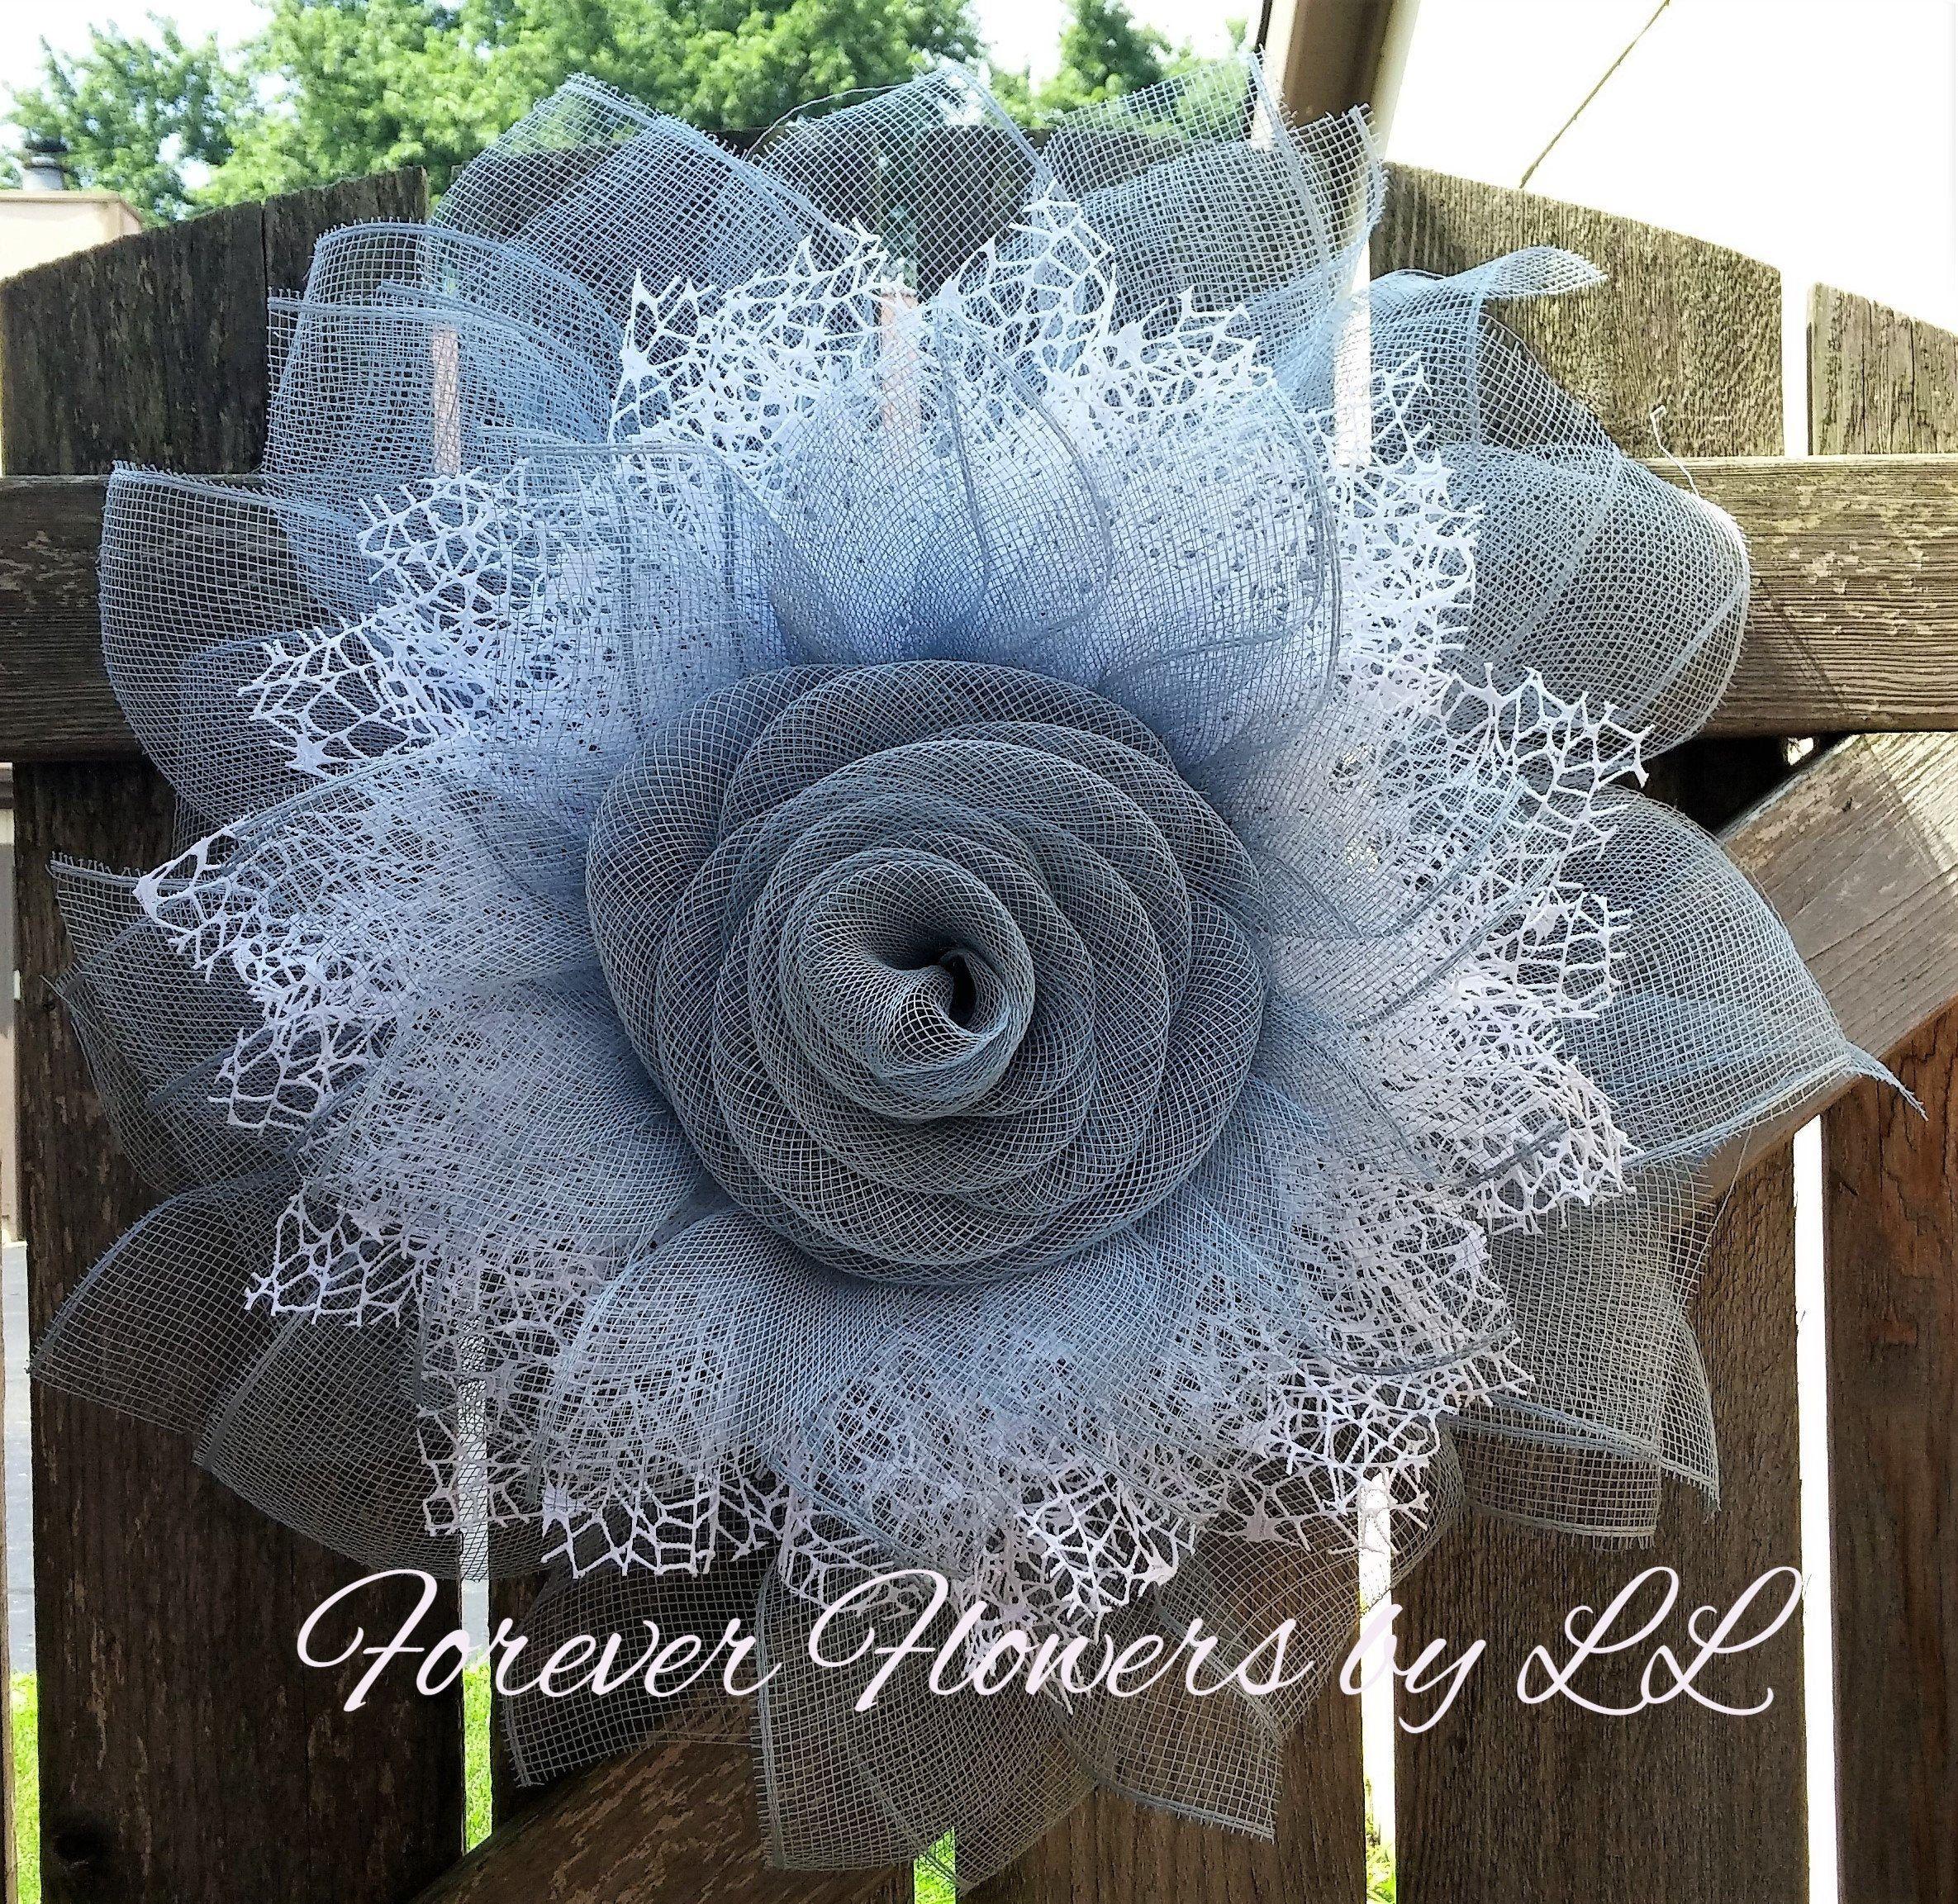 Photo of Burlap Wreath, Deco Mesh Wreath, Wreath, Front Door Wreath, Wall Decor, Summer Wreath, Flower Wreath, Deco Wreath, Spring Wreath